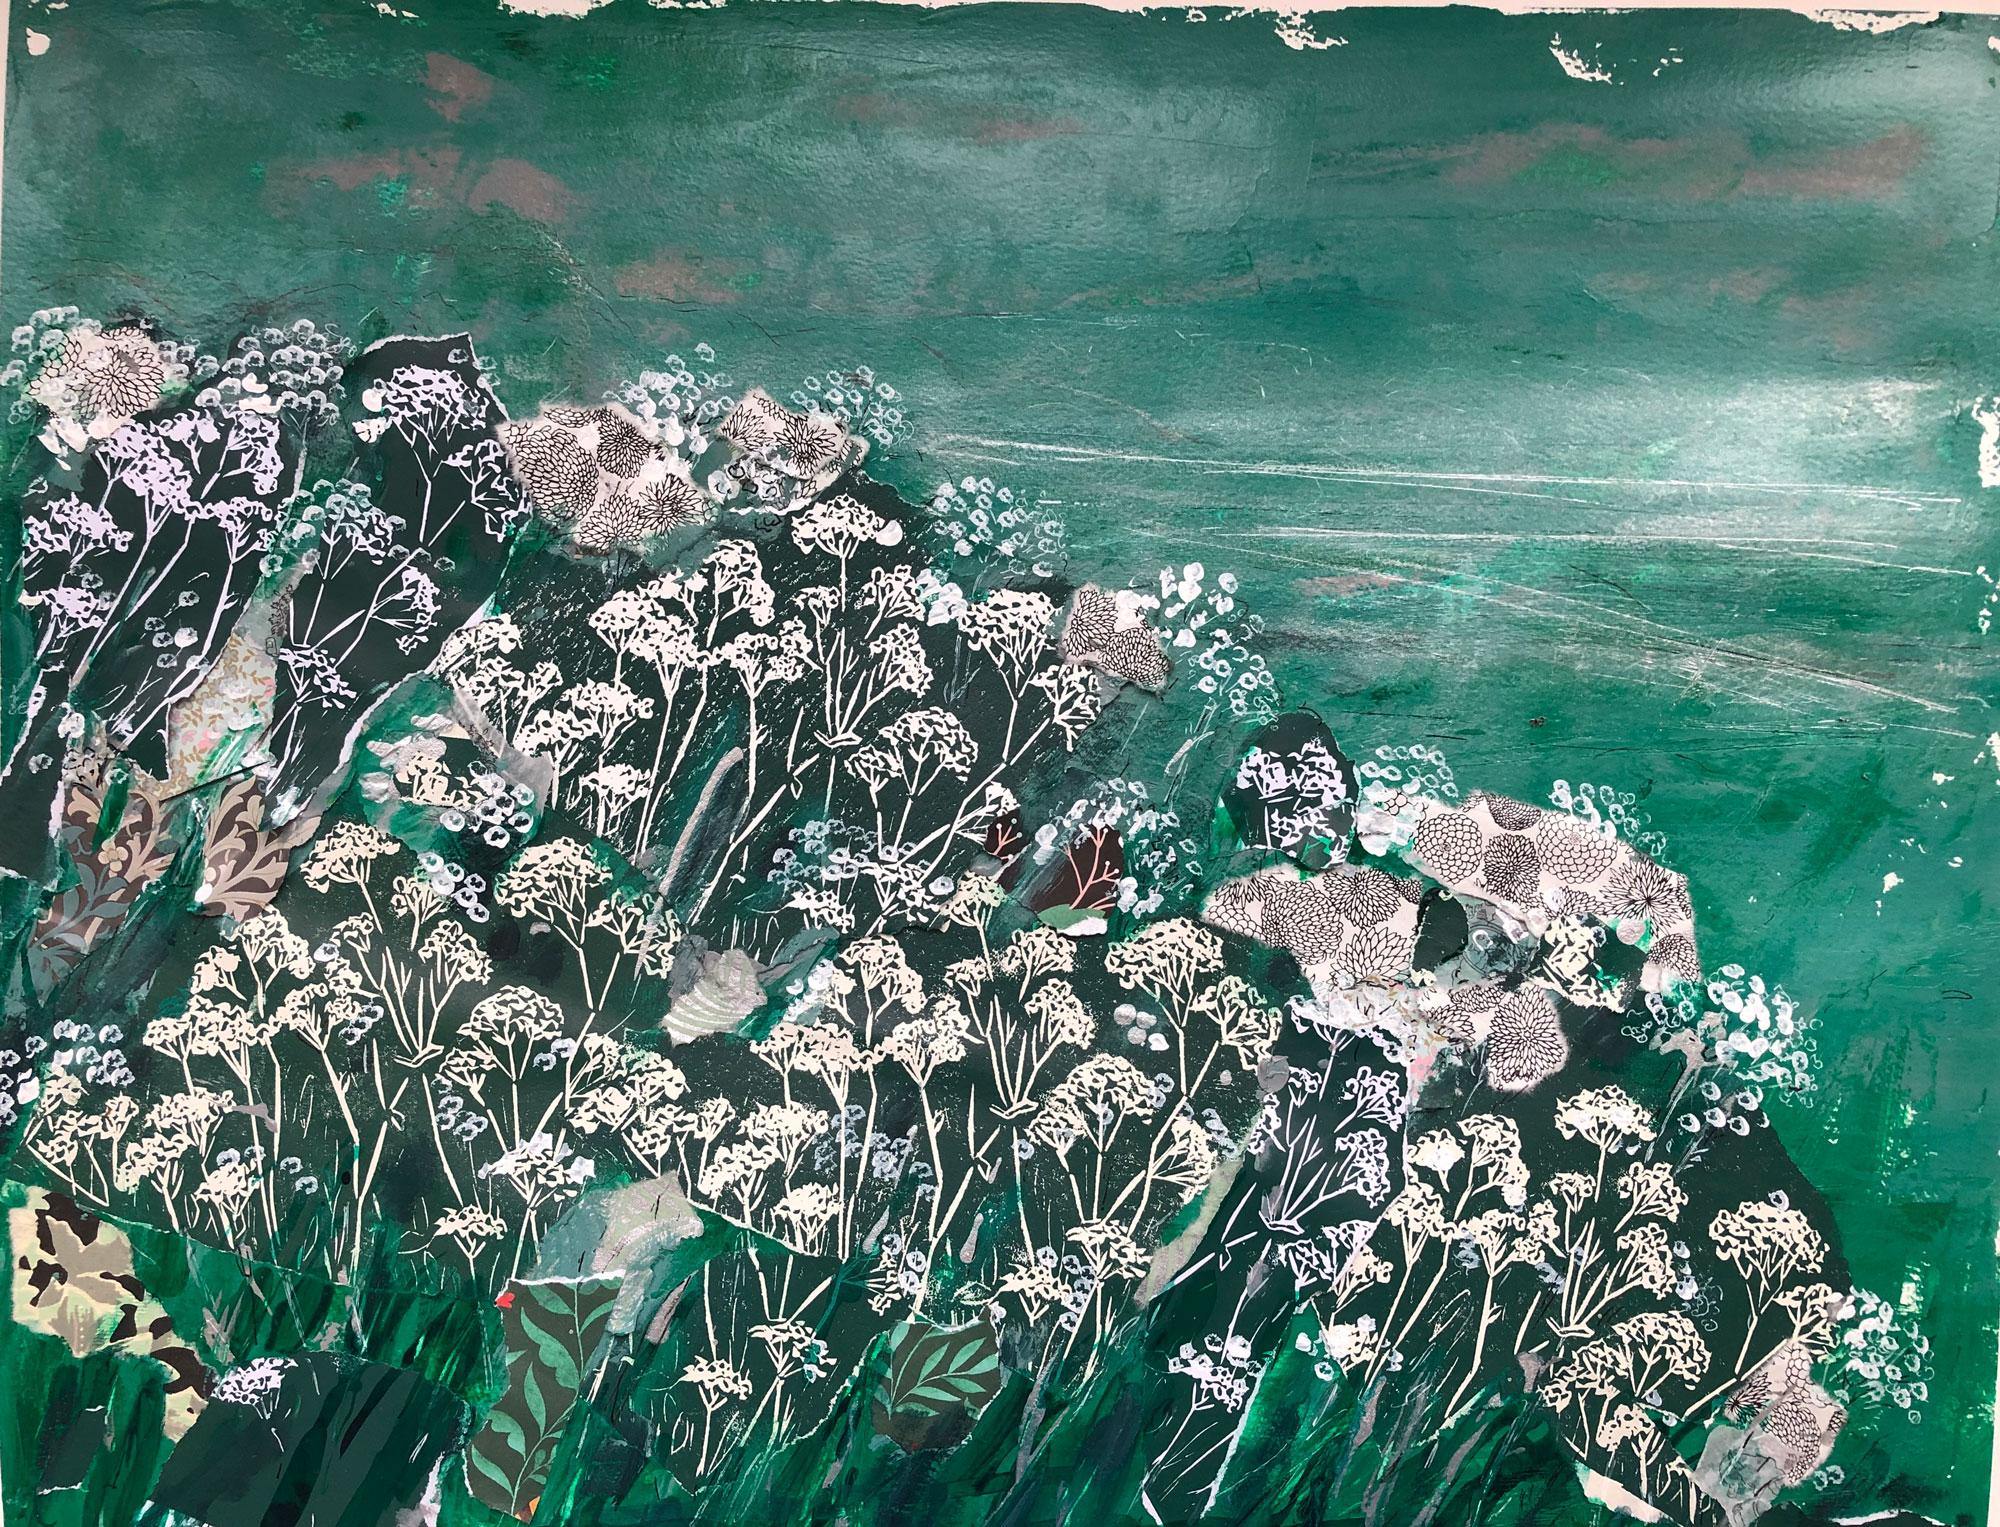 Marika Sonne | Green Flower Field | Mixed media | 50x40cm unframed | £150